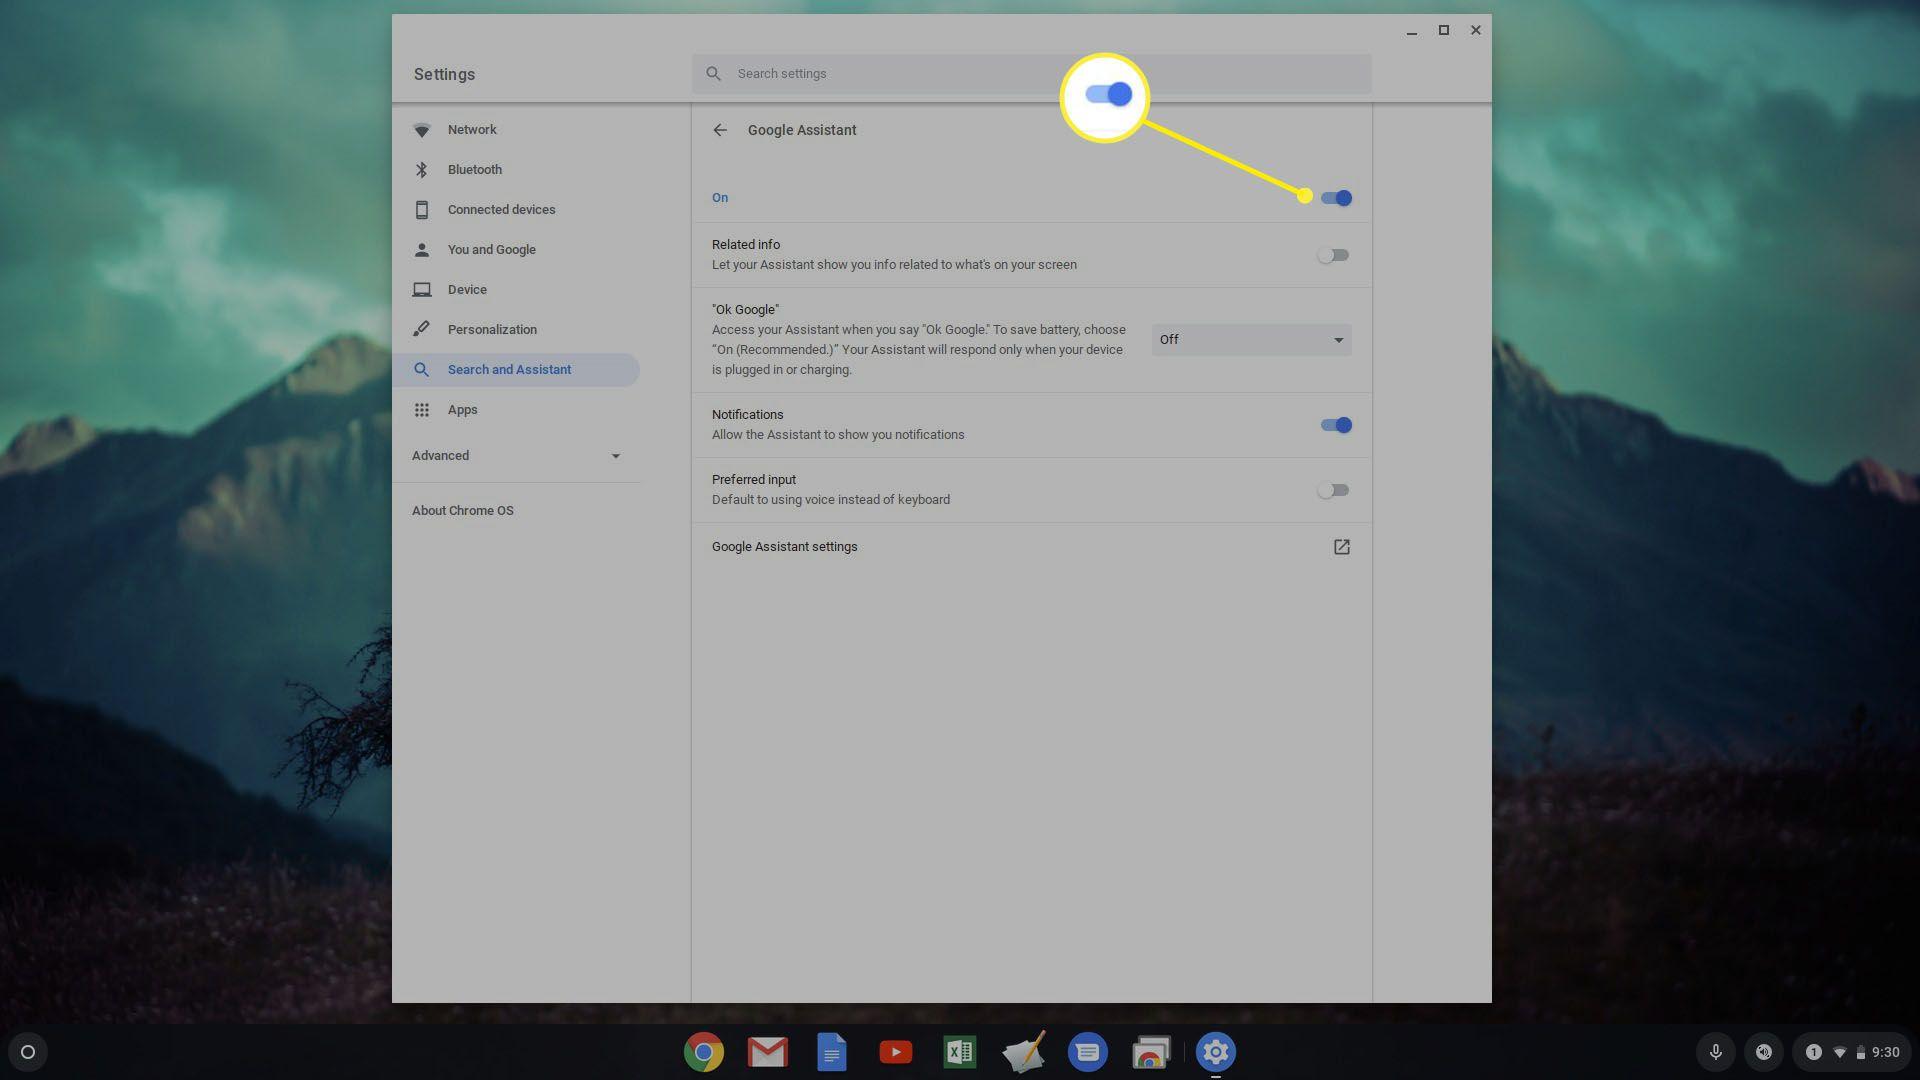 Google Assistant options